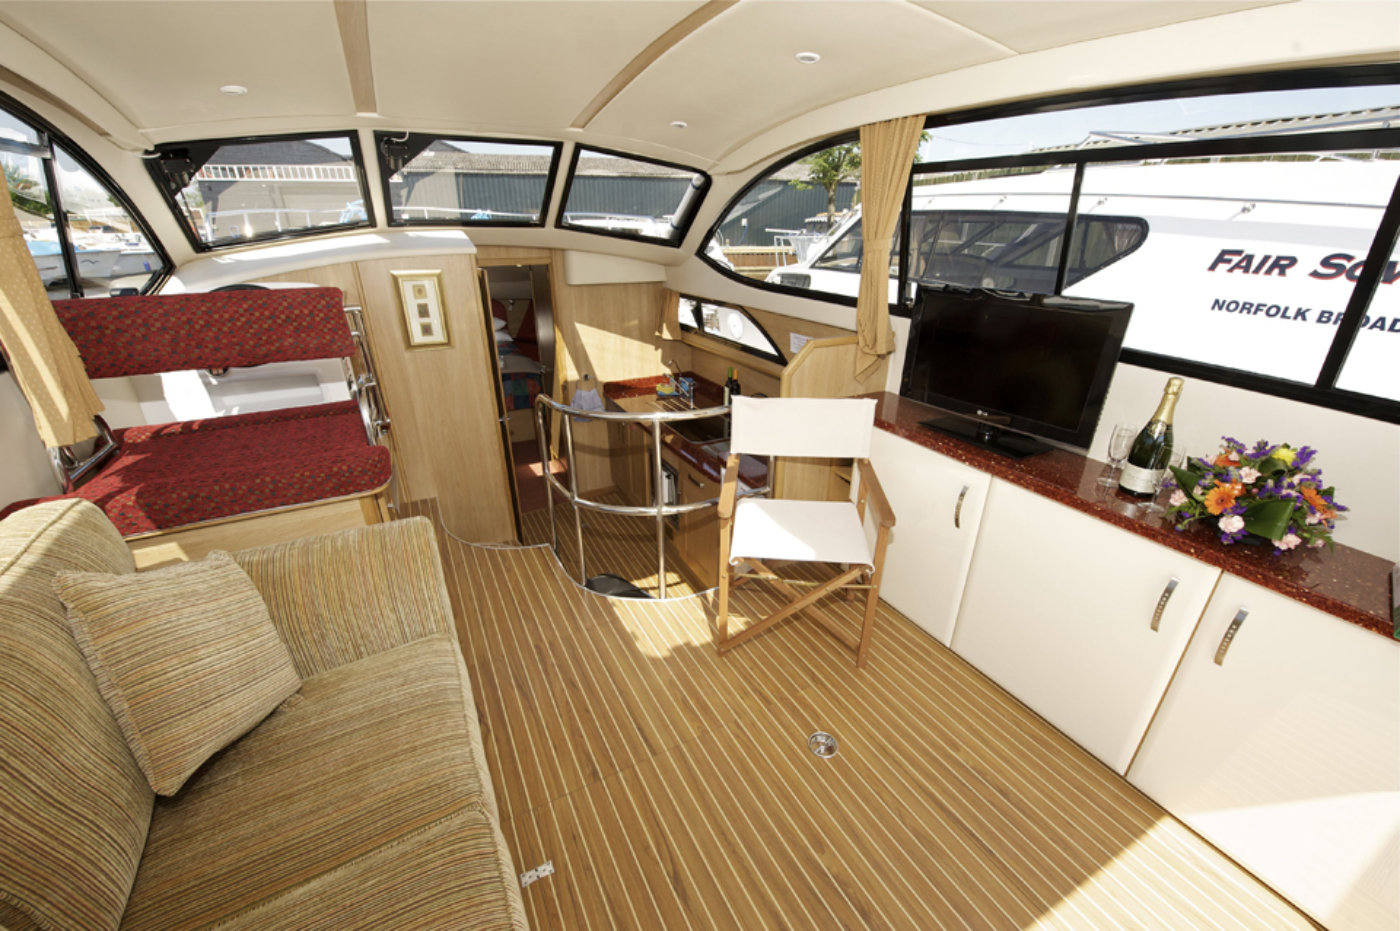 Fair Jubilee Boating Holidays Norfolk Broads Direct